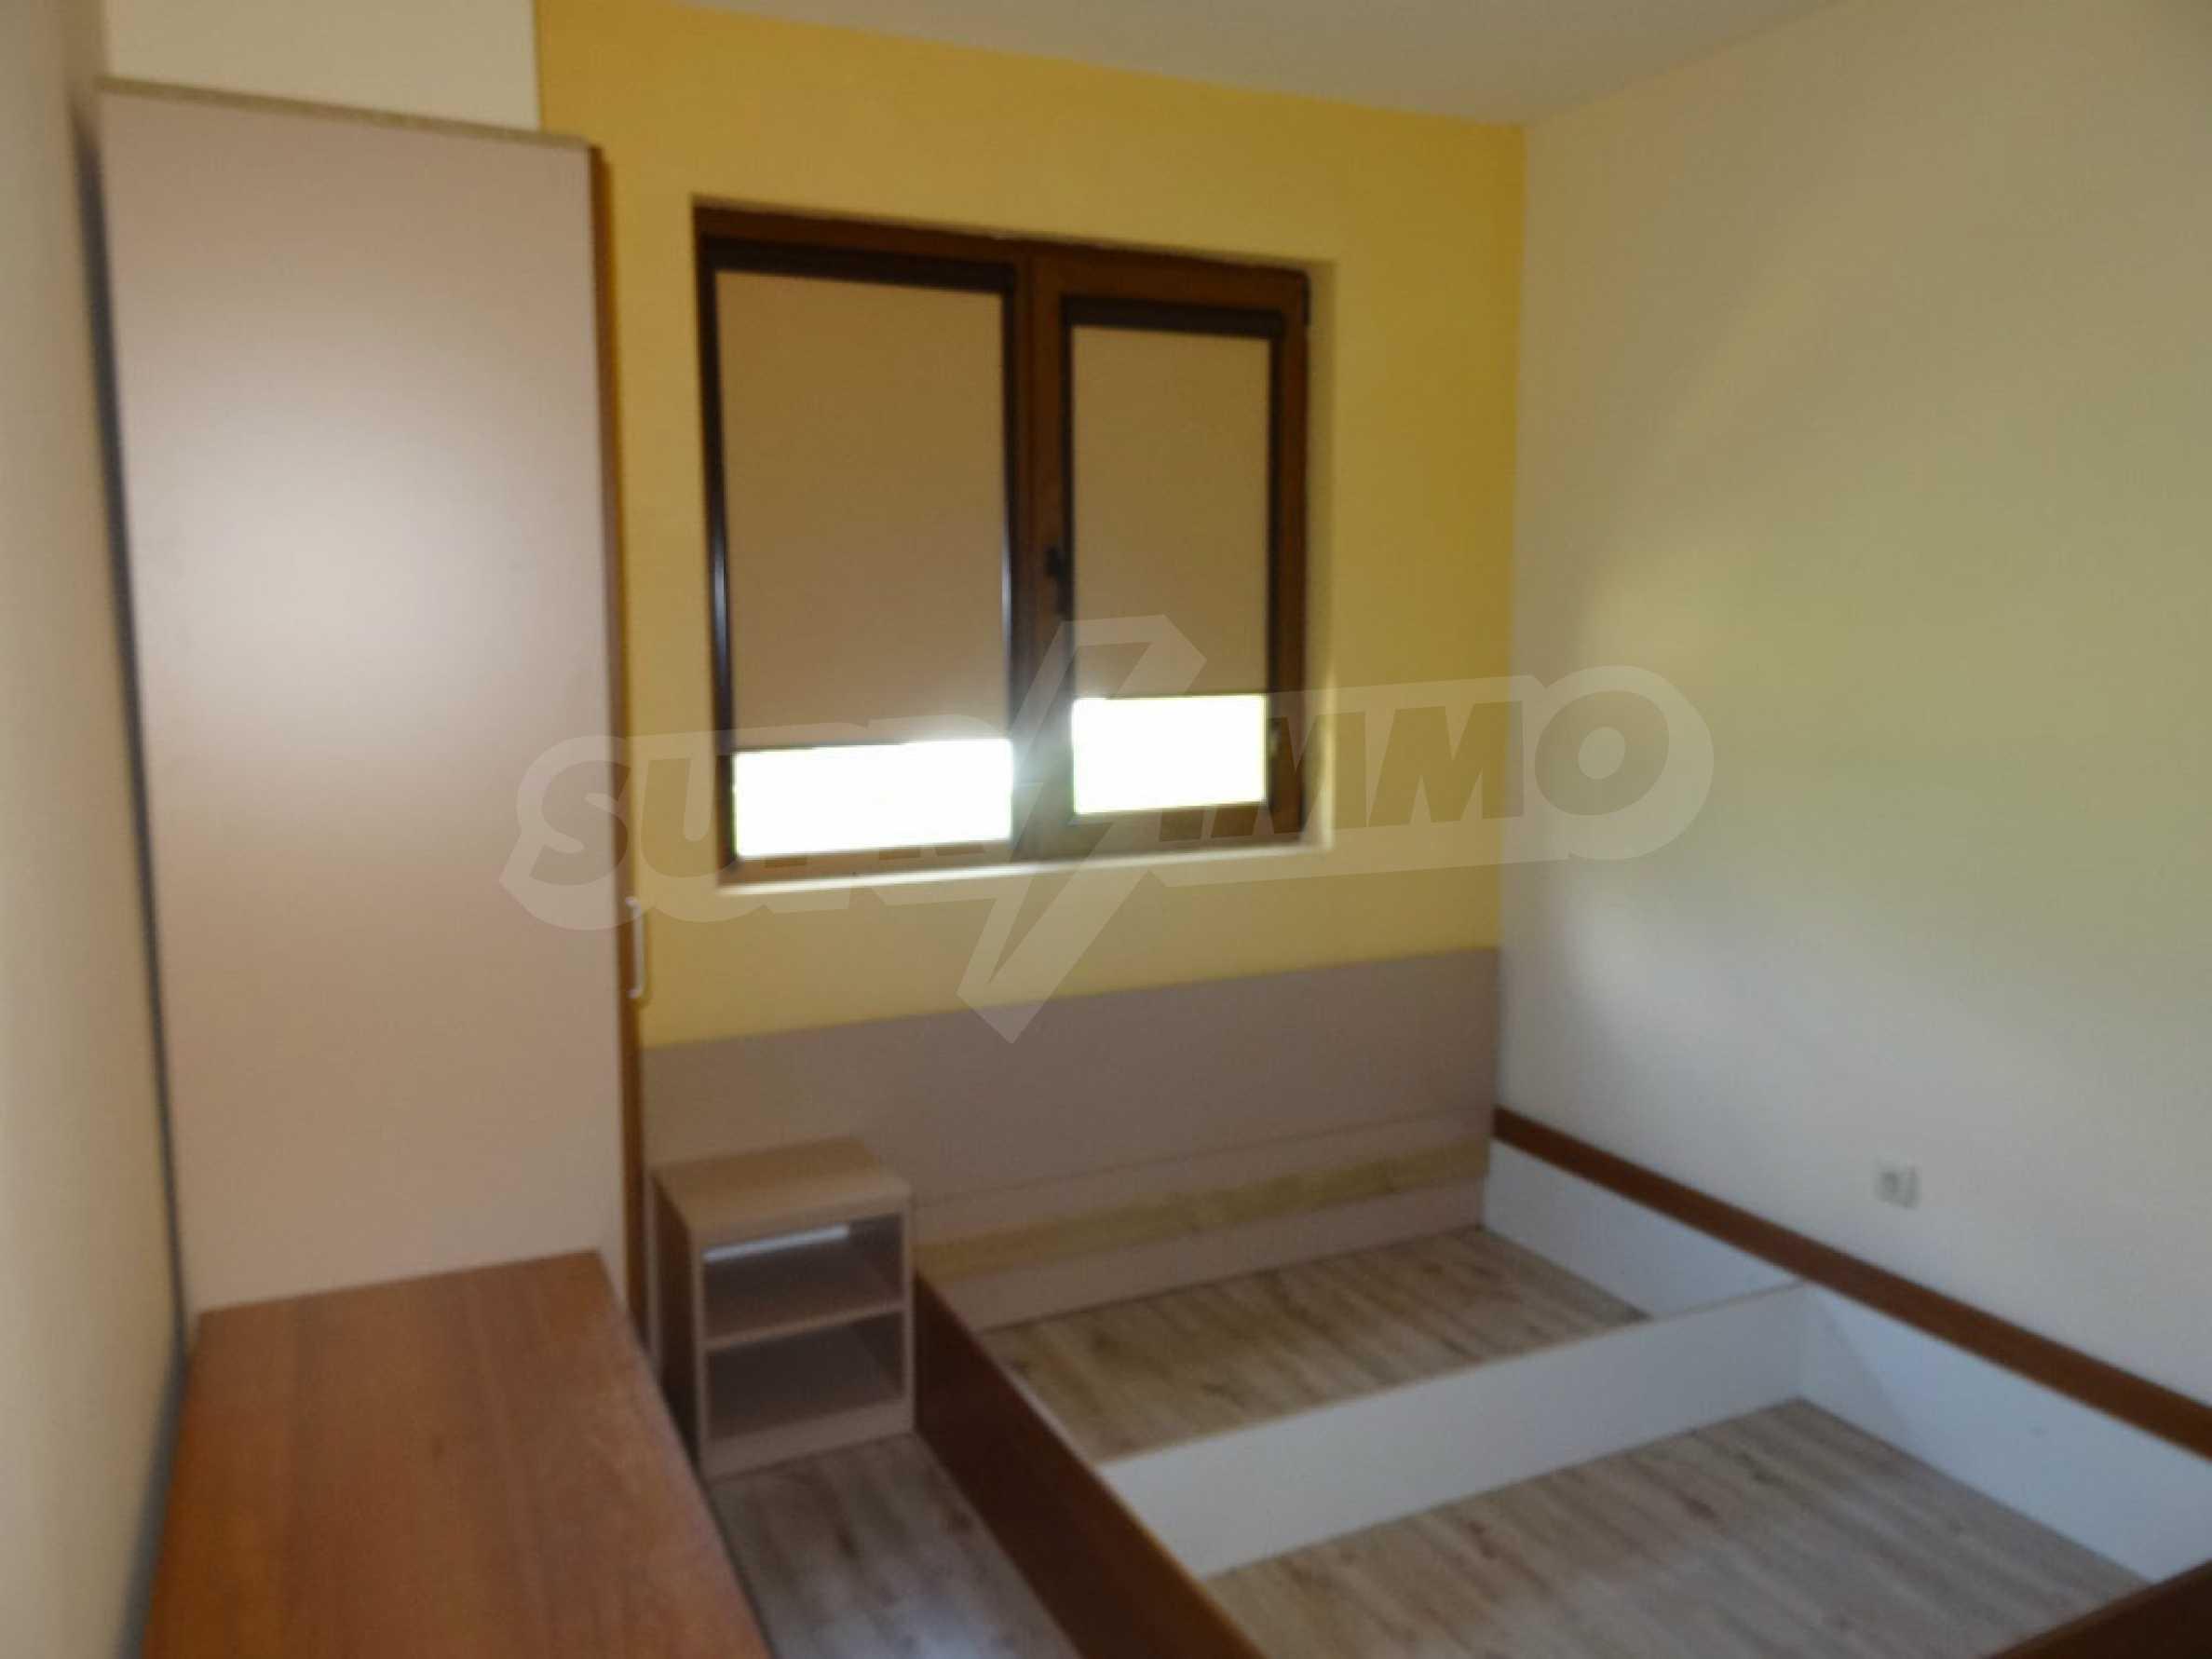 Двустаен апартамент близо до курорти Албена и Кранево 5